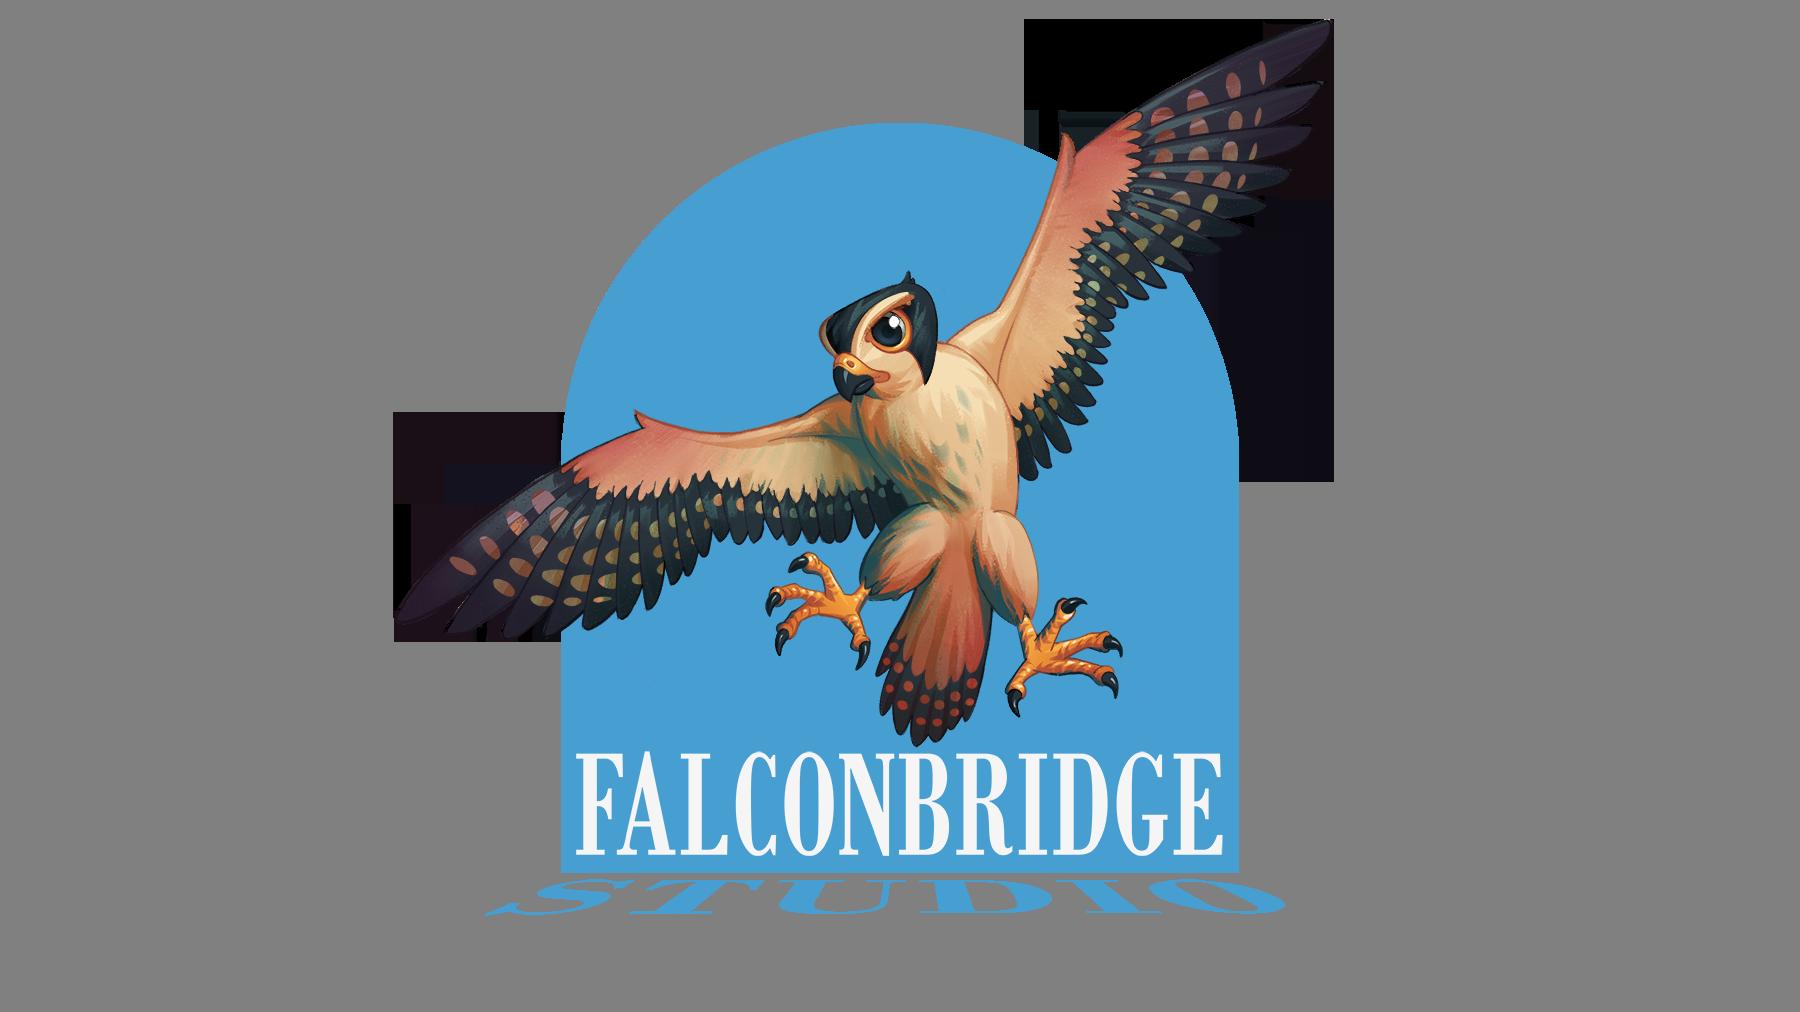 FalconBridgeLogo.png